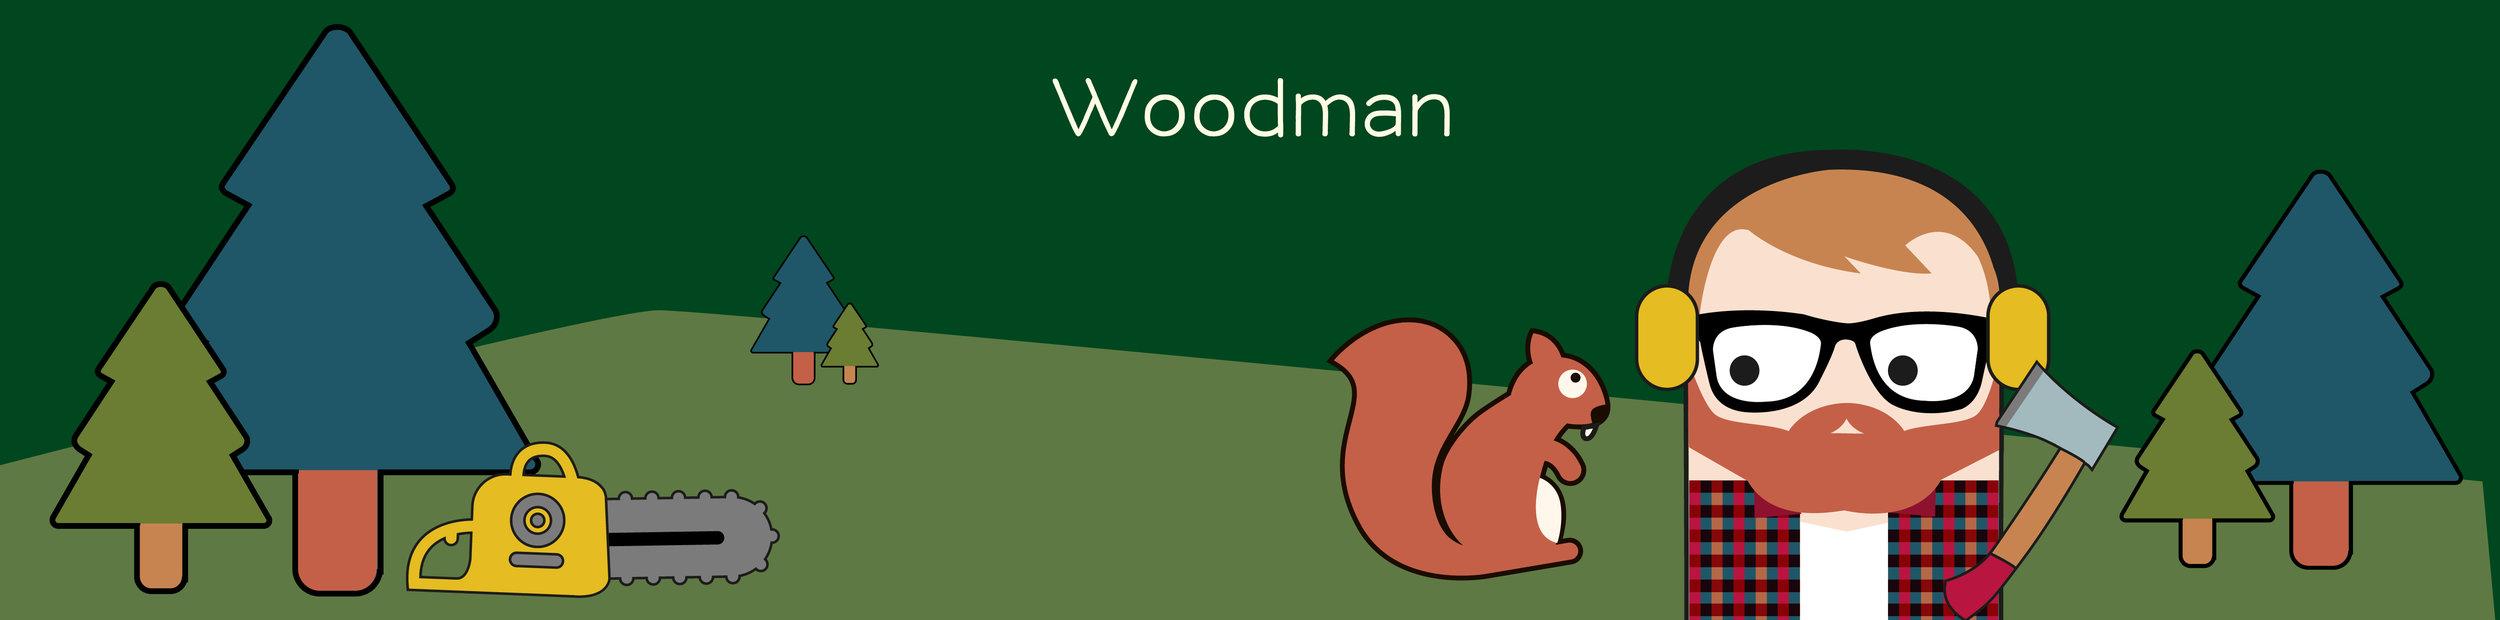 banner-woodman